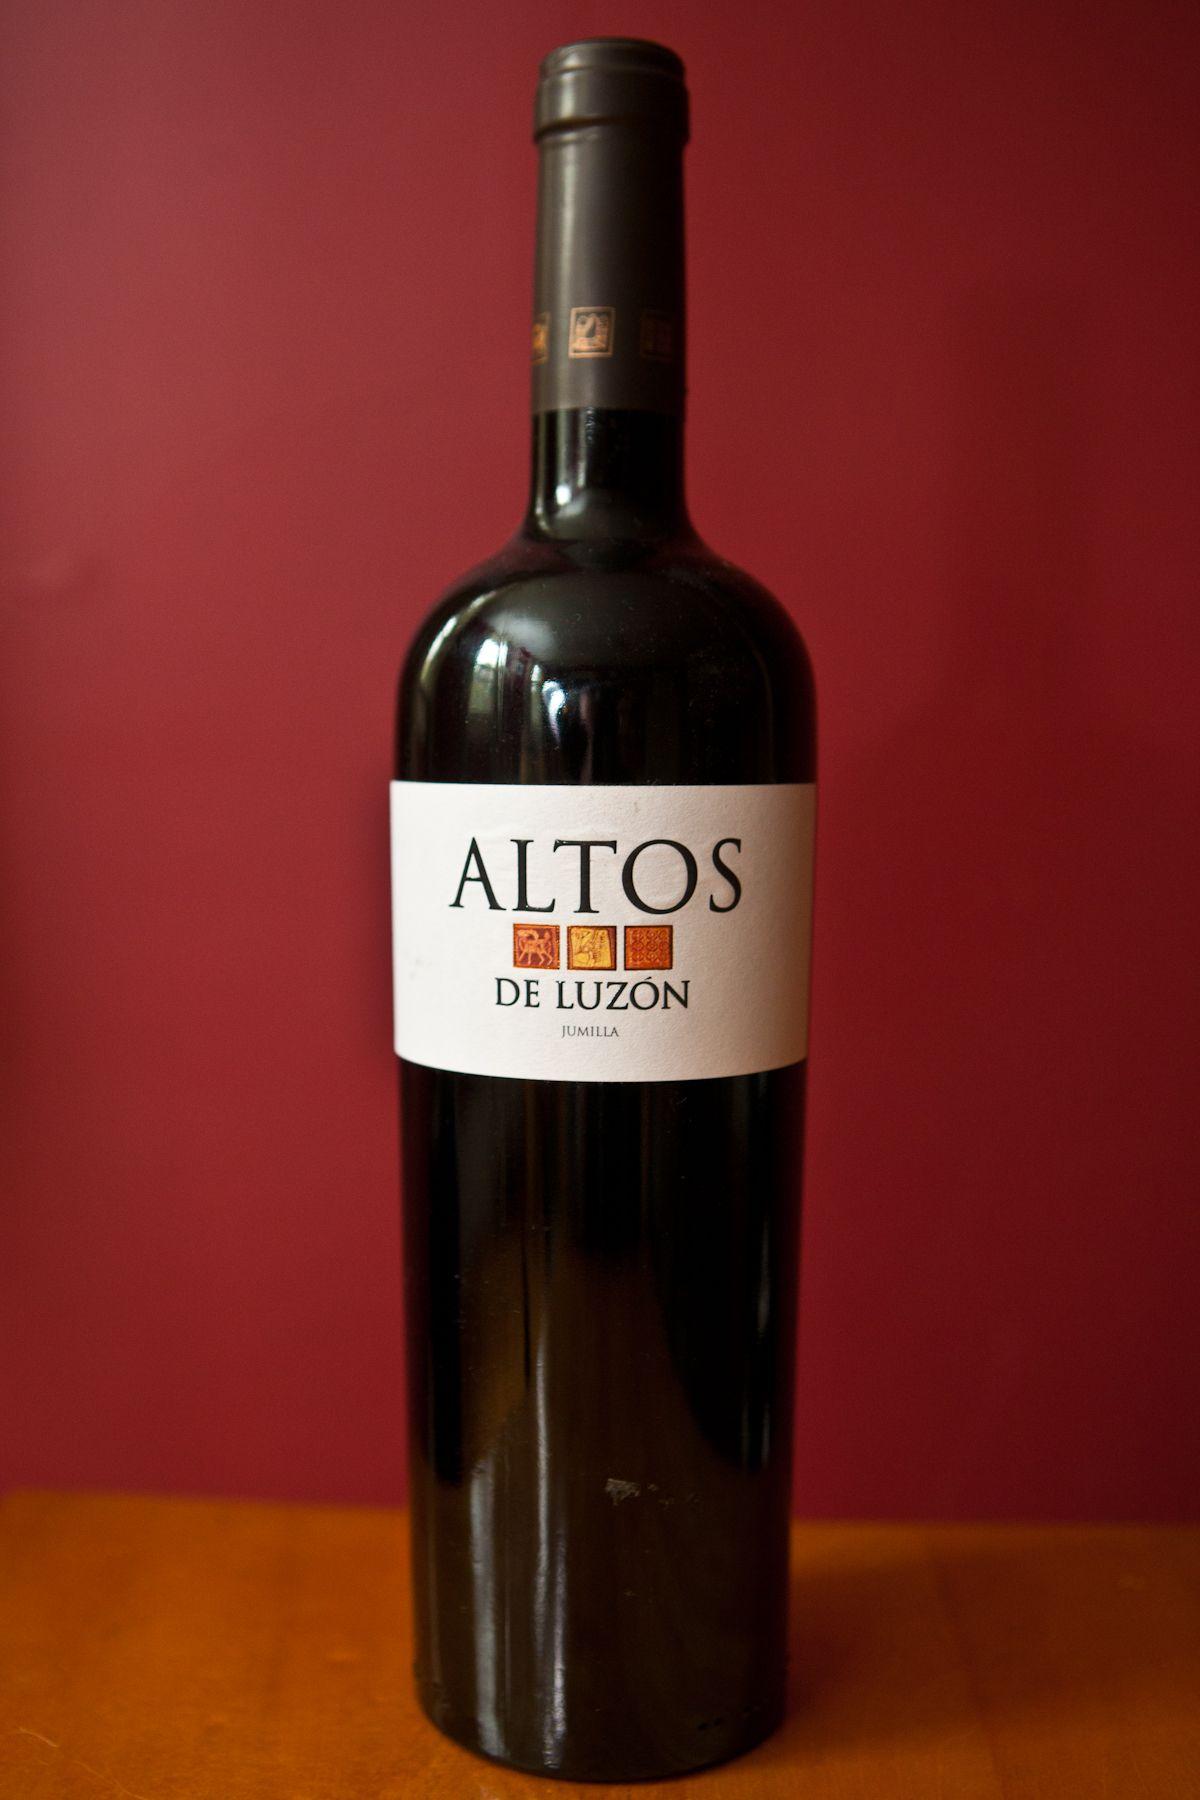 Pin By Giovanni J Cavallaro On Some Wines I Like Organic Wine Alcoholic Drinks Red Wine